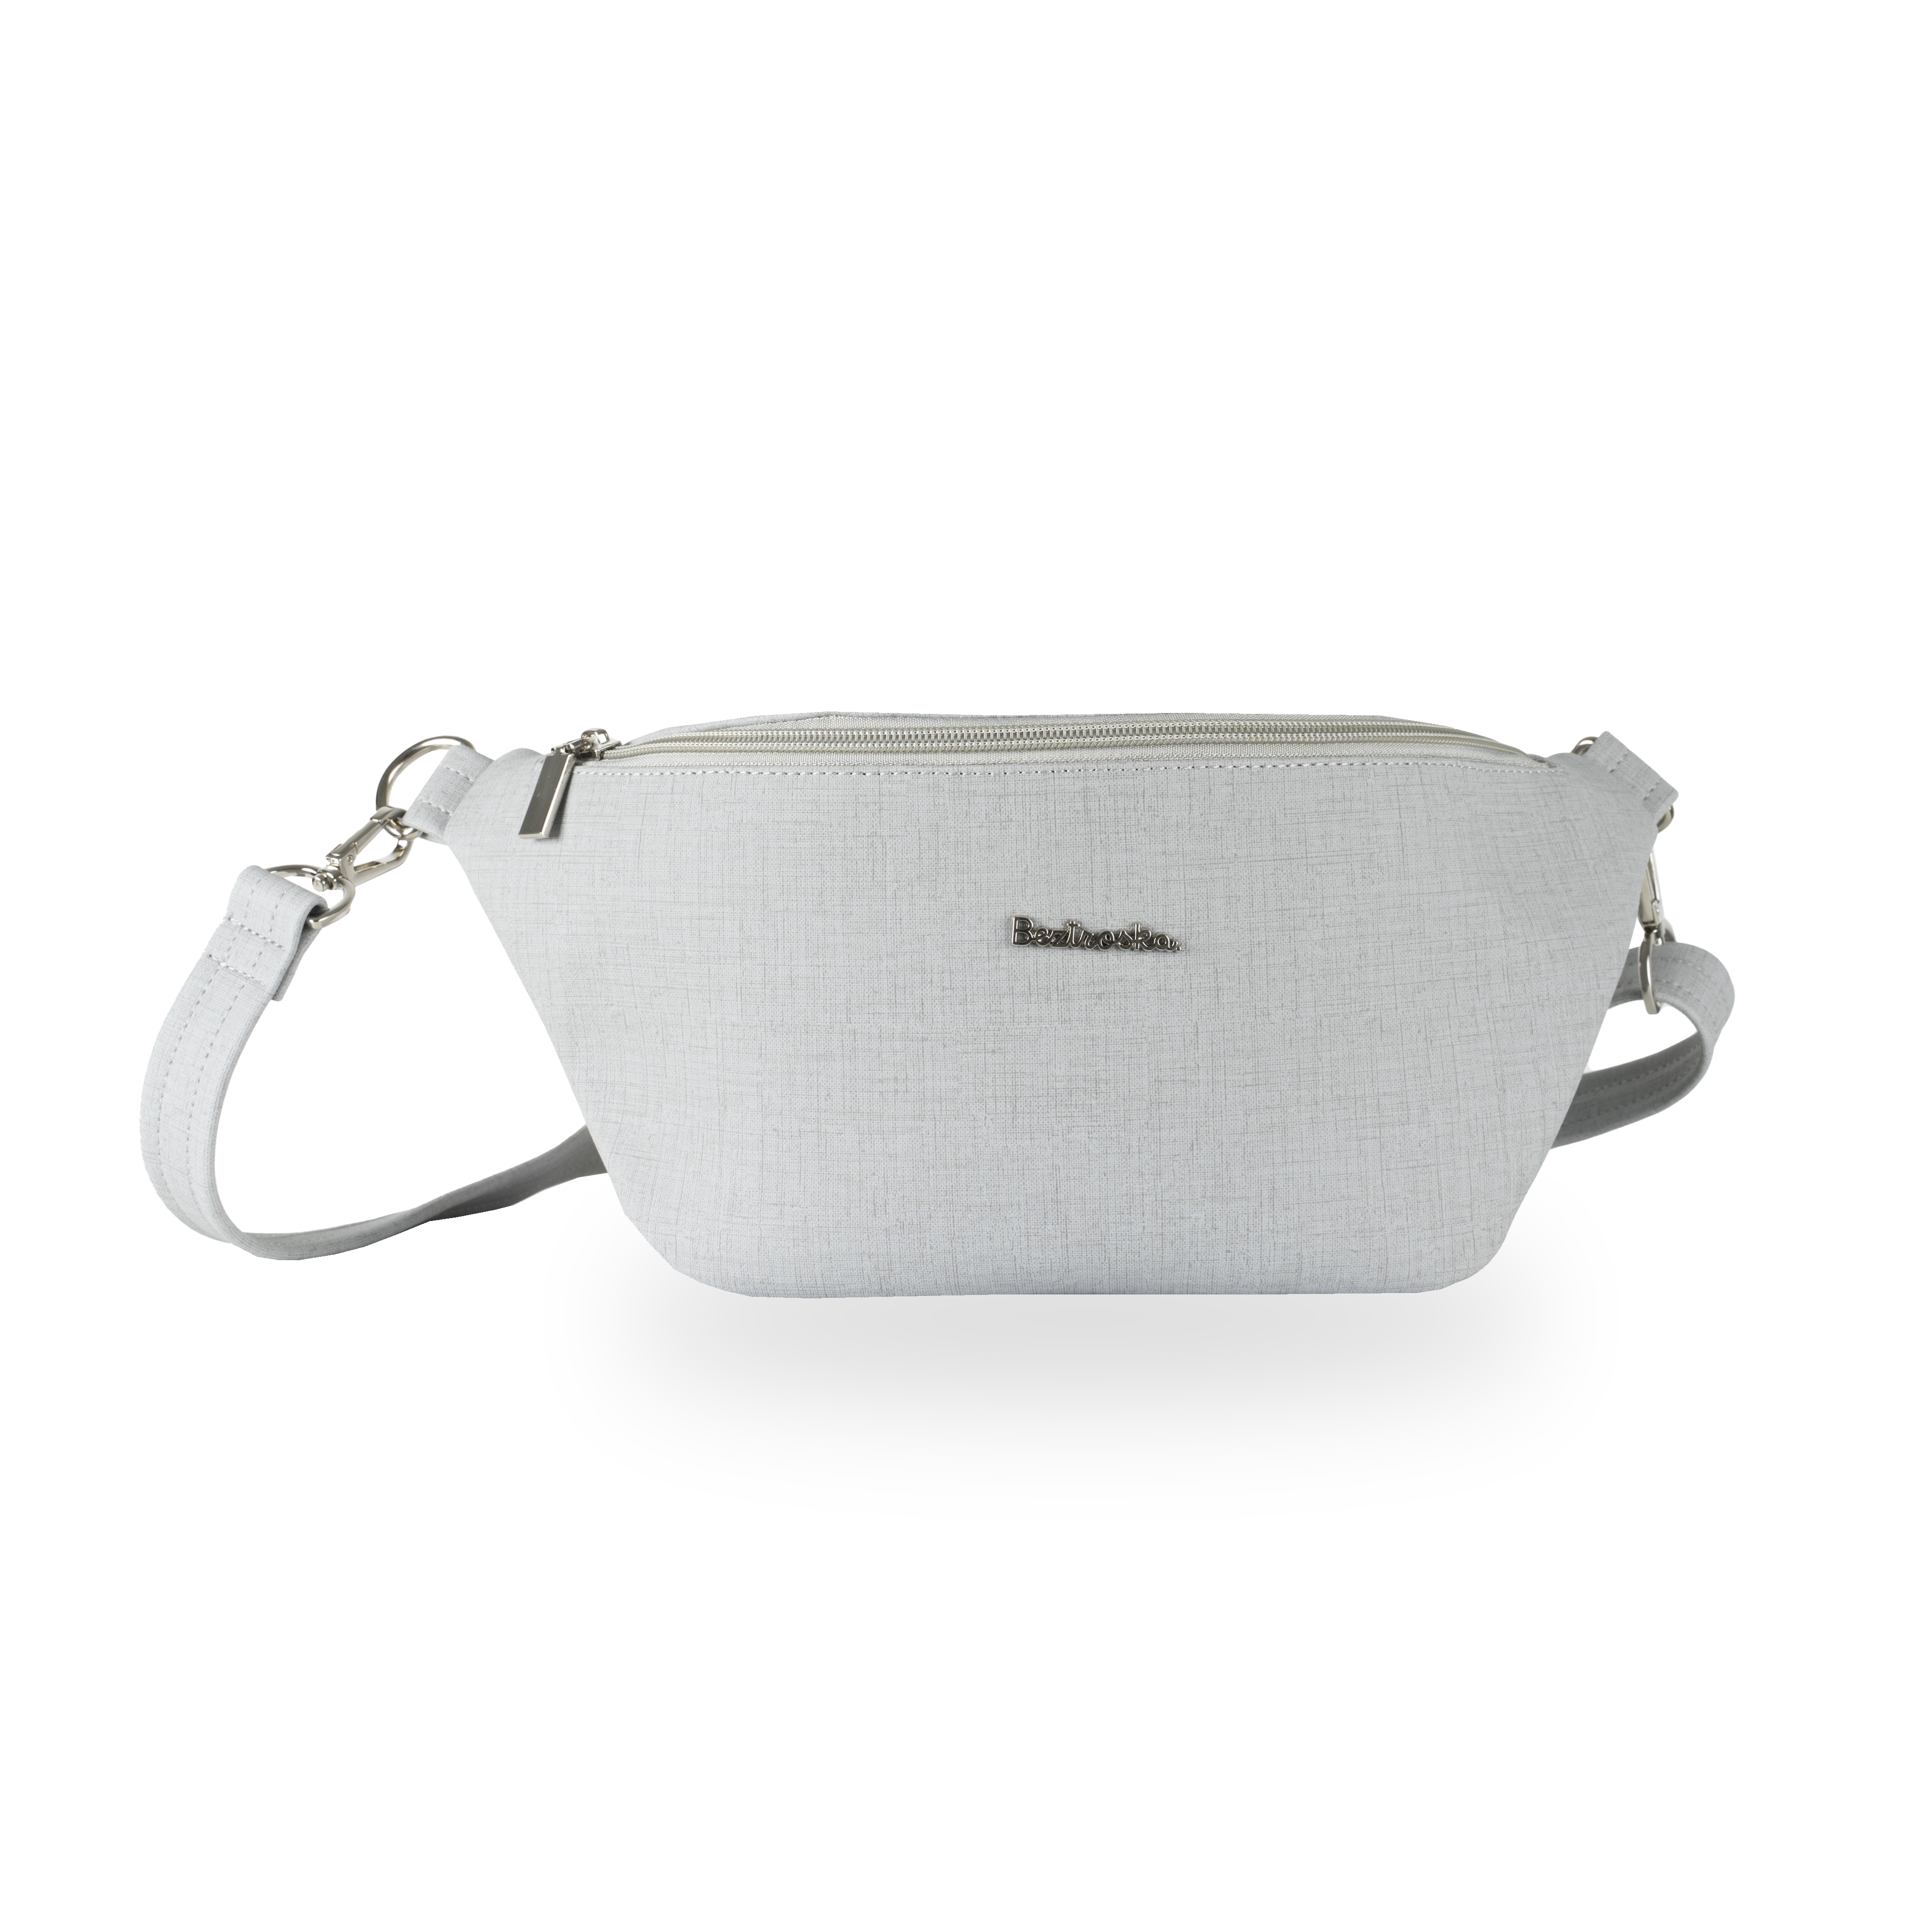 Beztroska taška LEDVINKA light grey